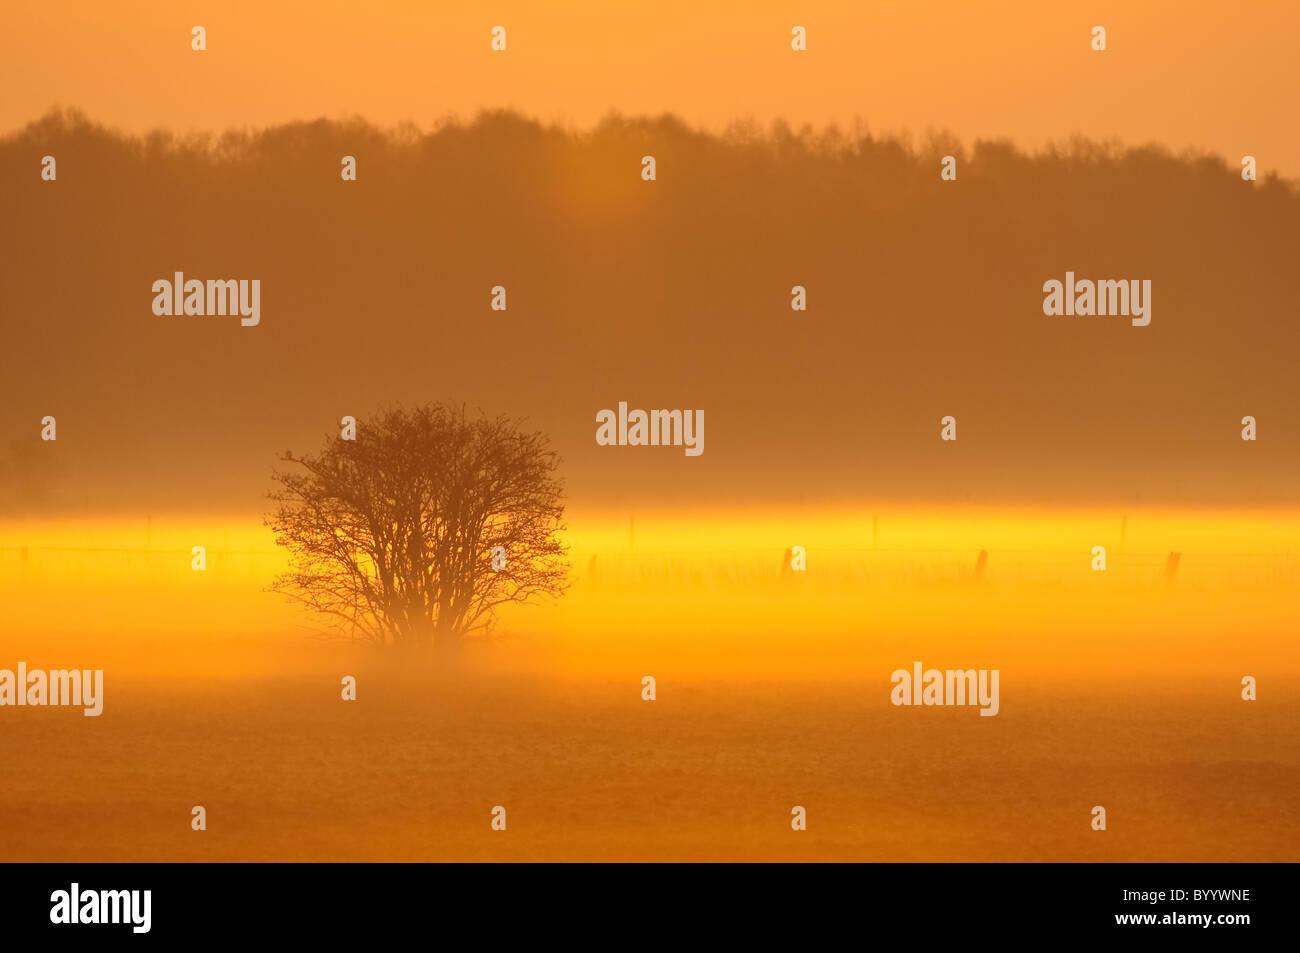 Morning Mist, dreamy landscape - Stock Image